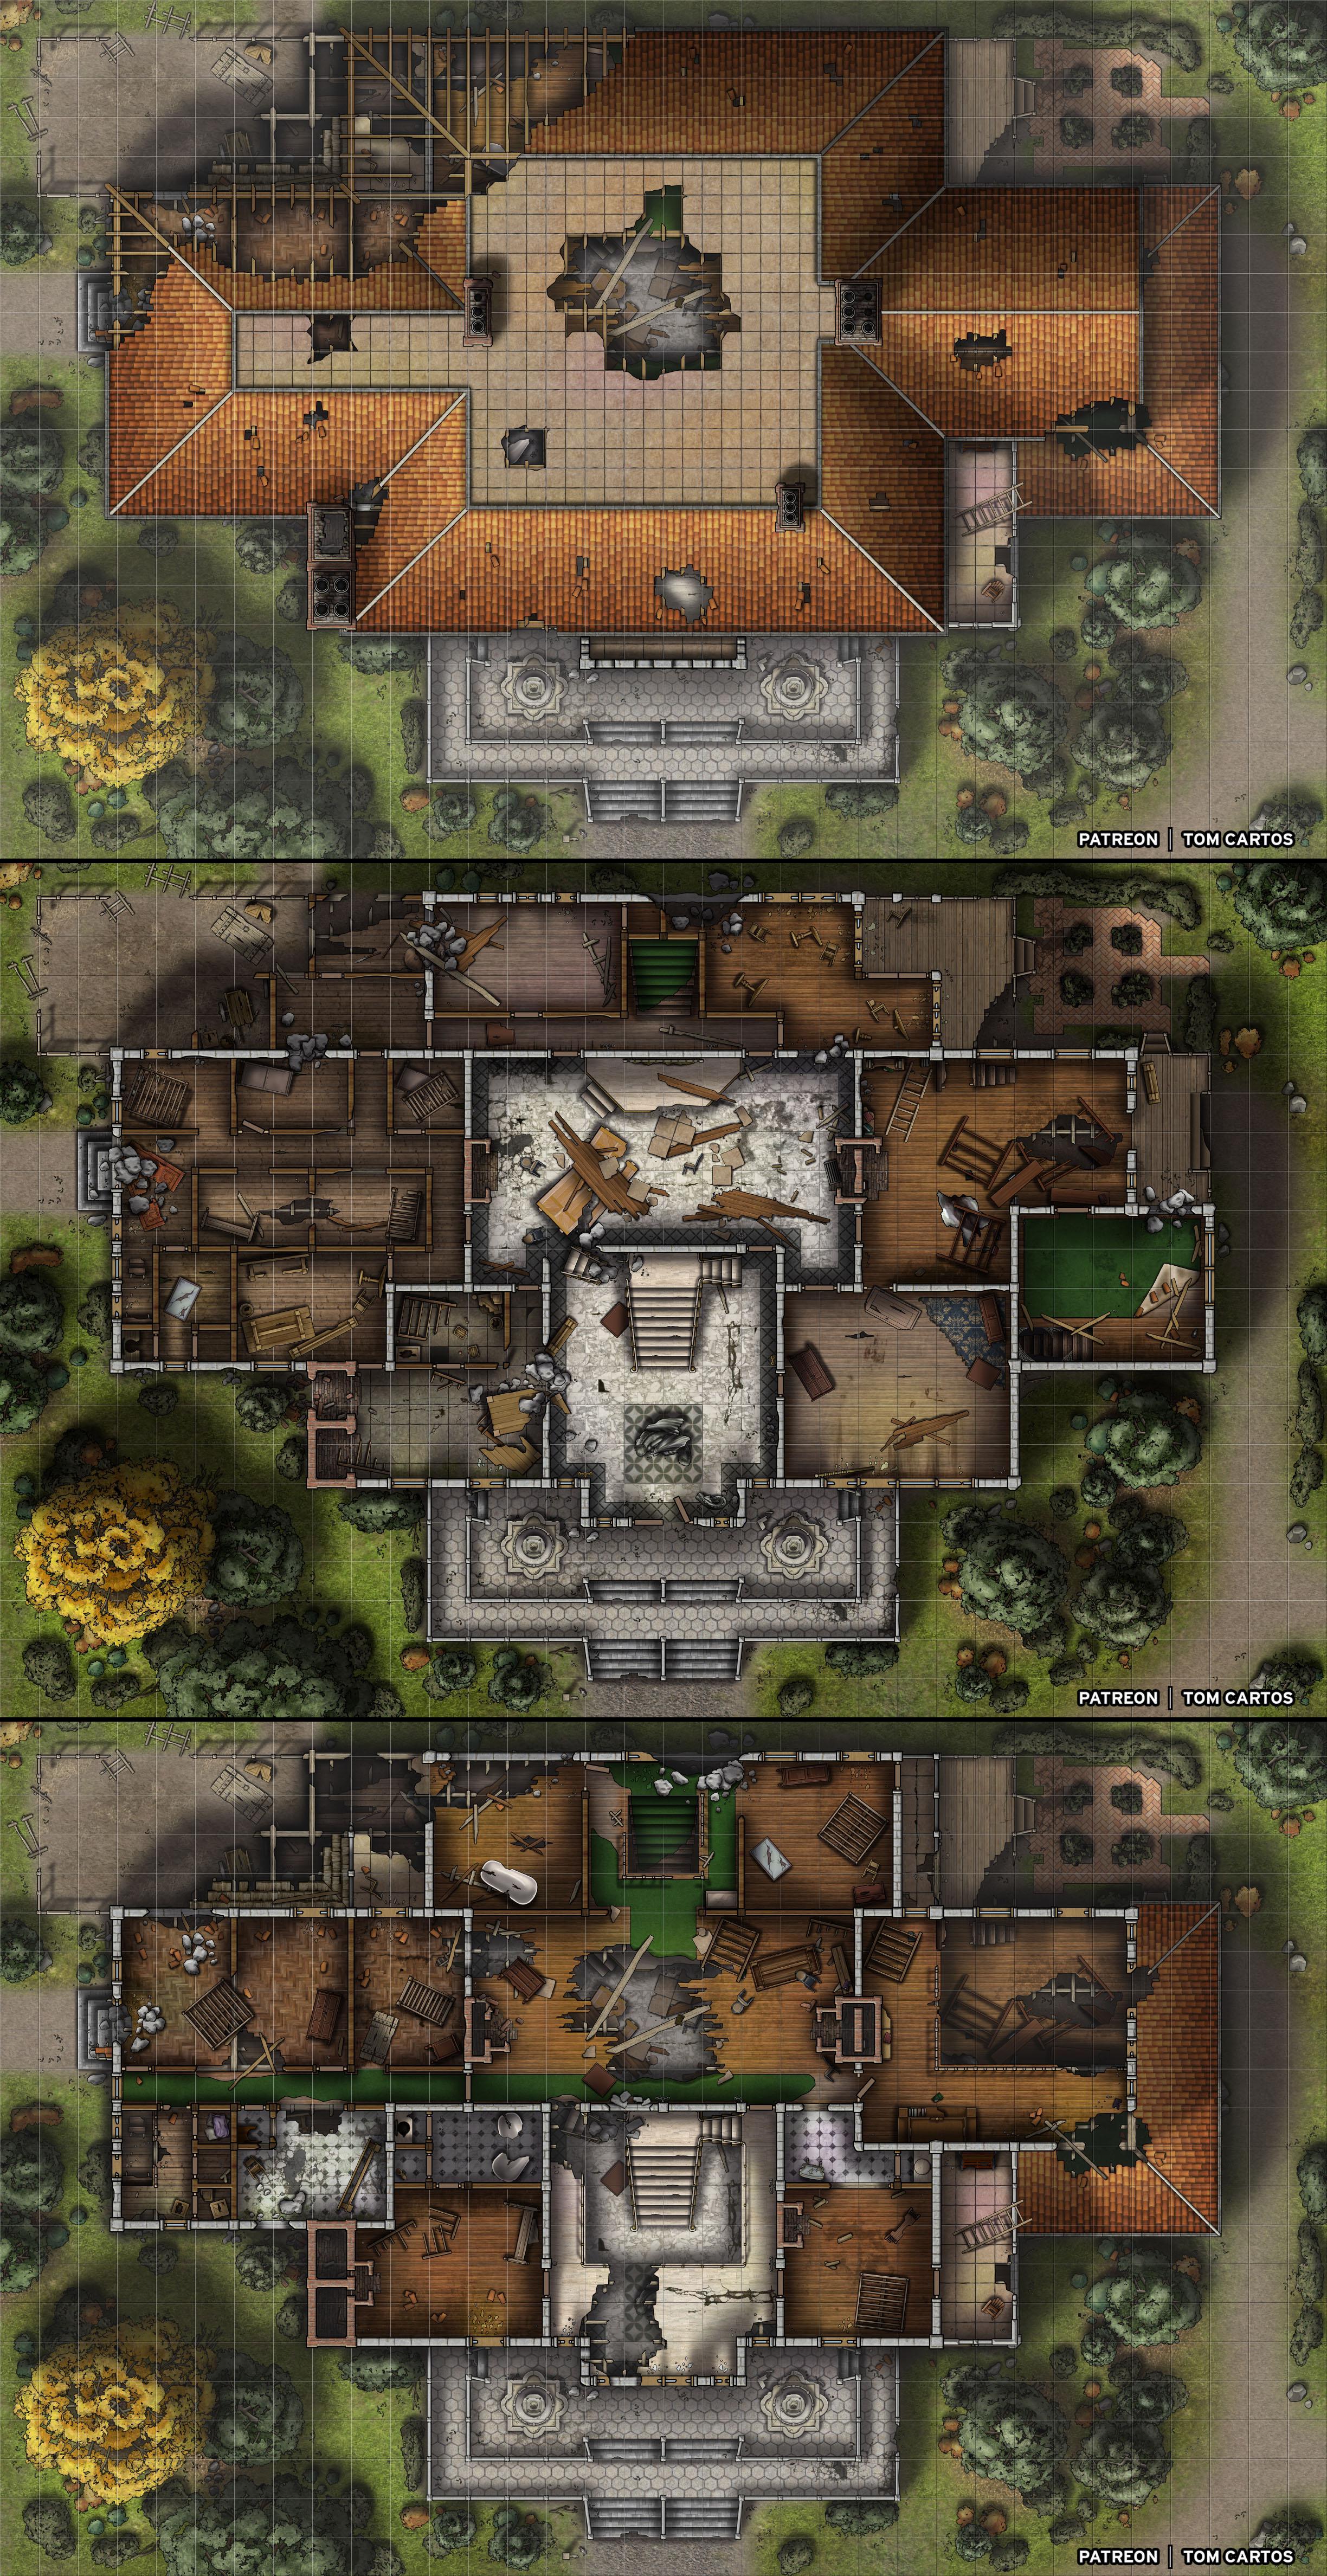 Manor Dnd Map : manor, Ruins, Essenheim, Manor, Three, Level, Abandoned, Mansion, [34x22x3], Dndmaps